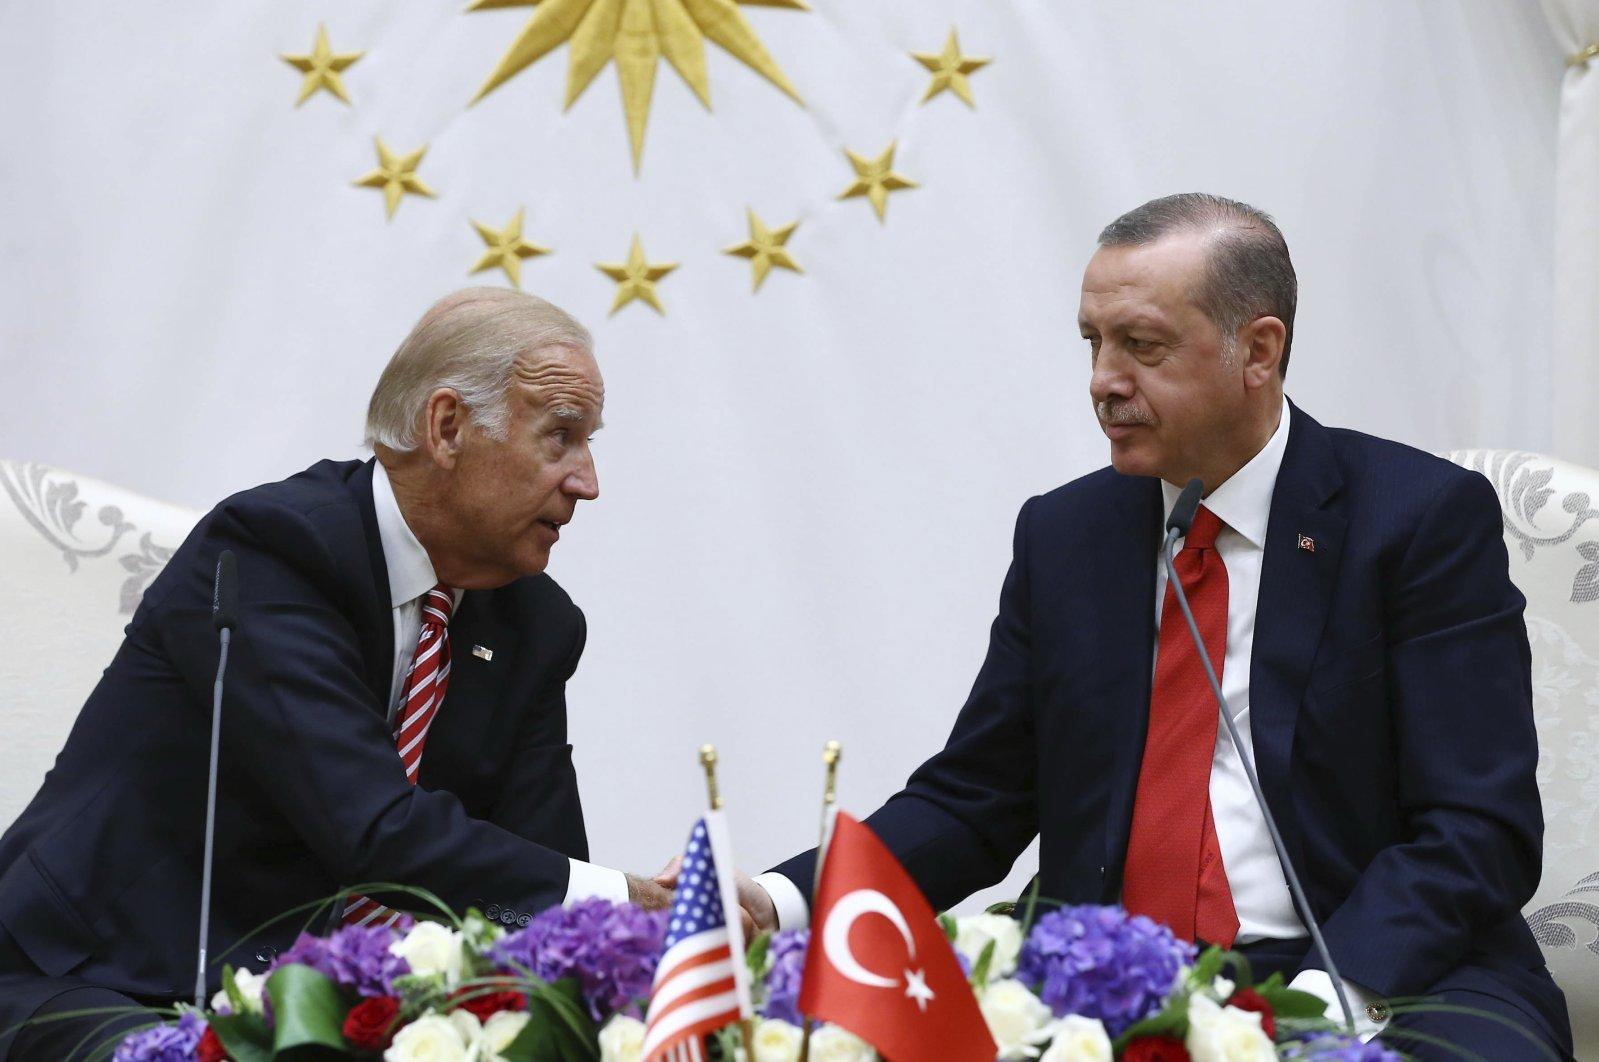 U.S. then-Vice President Joe Biden (L) and Turkish President Recep Tayyip Erdoğan during a meeting in Ankara, Turkey, Aug. 24, 2016. (AP Photo)